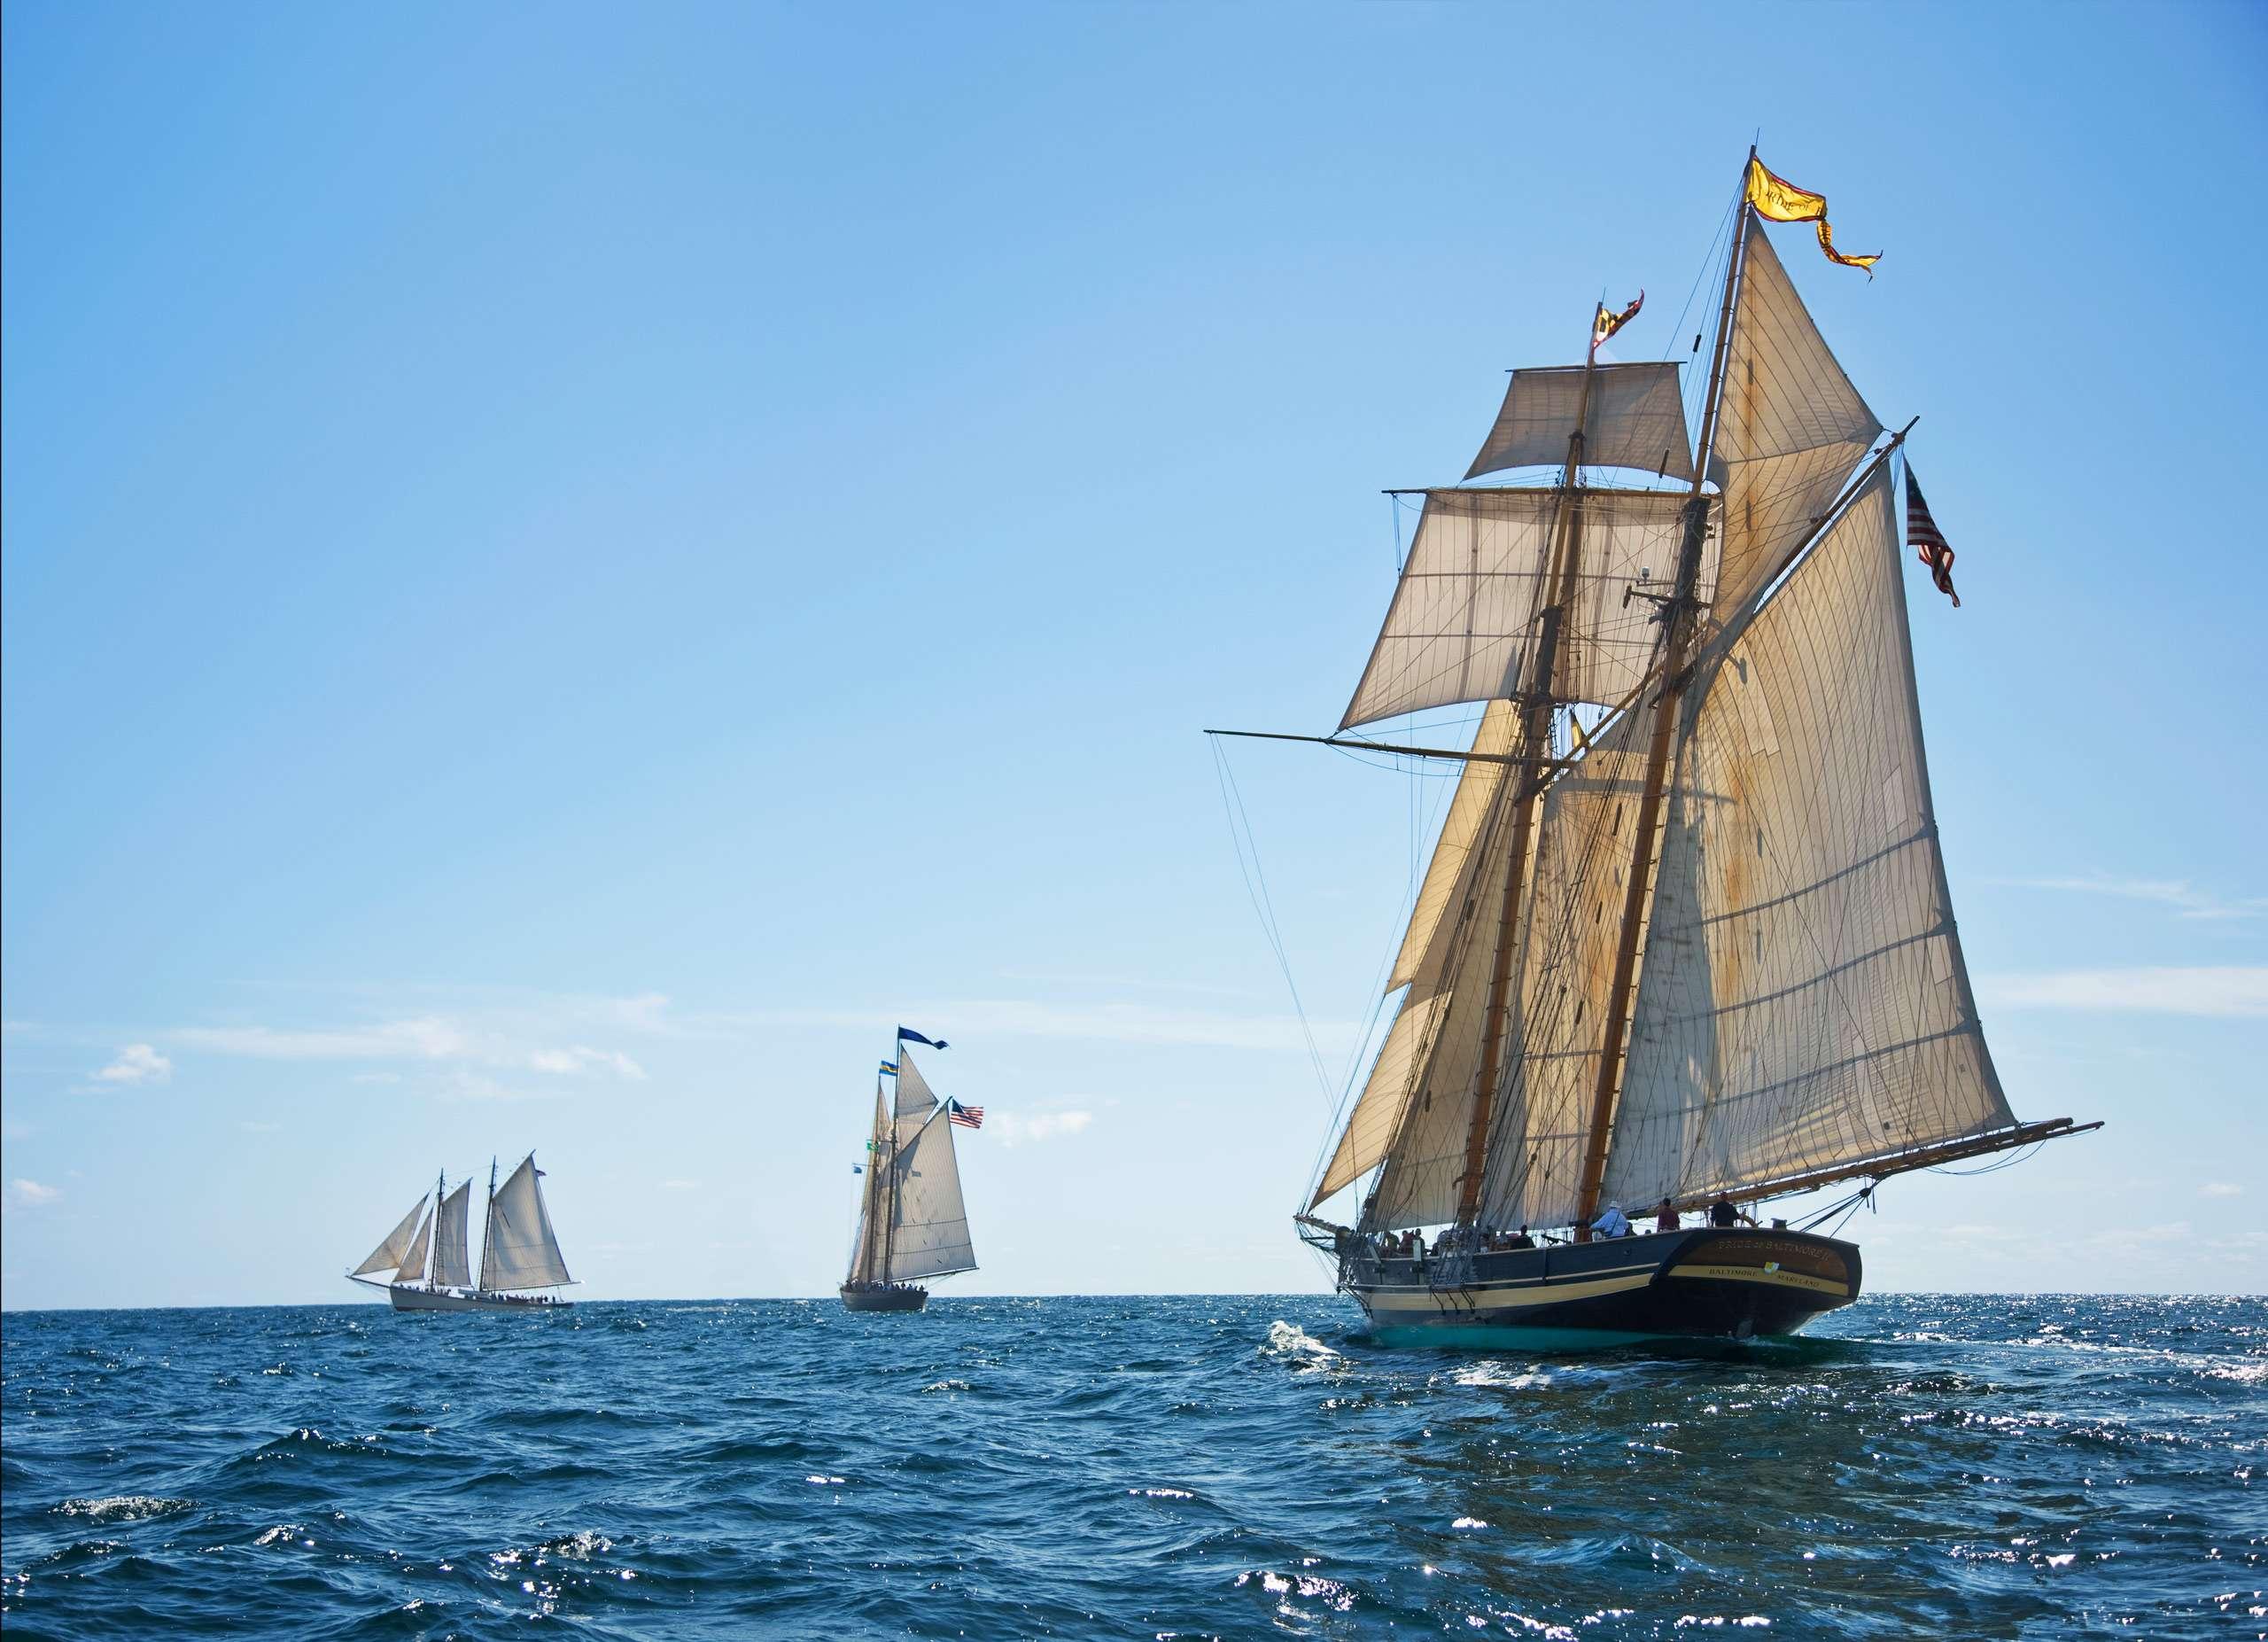 PORTFOLIO - Sailing - Windjammers #7   PCG450